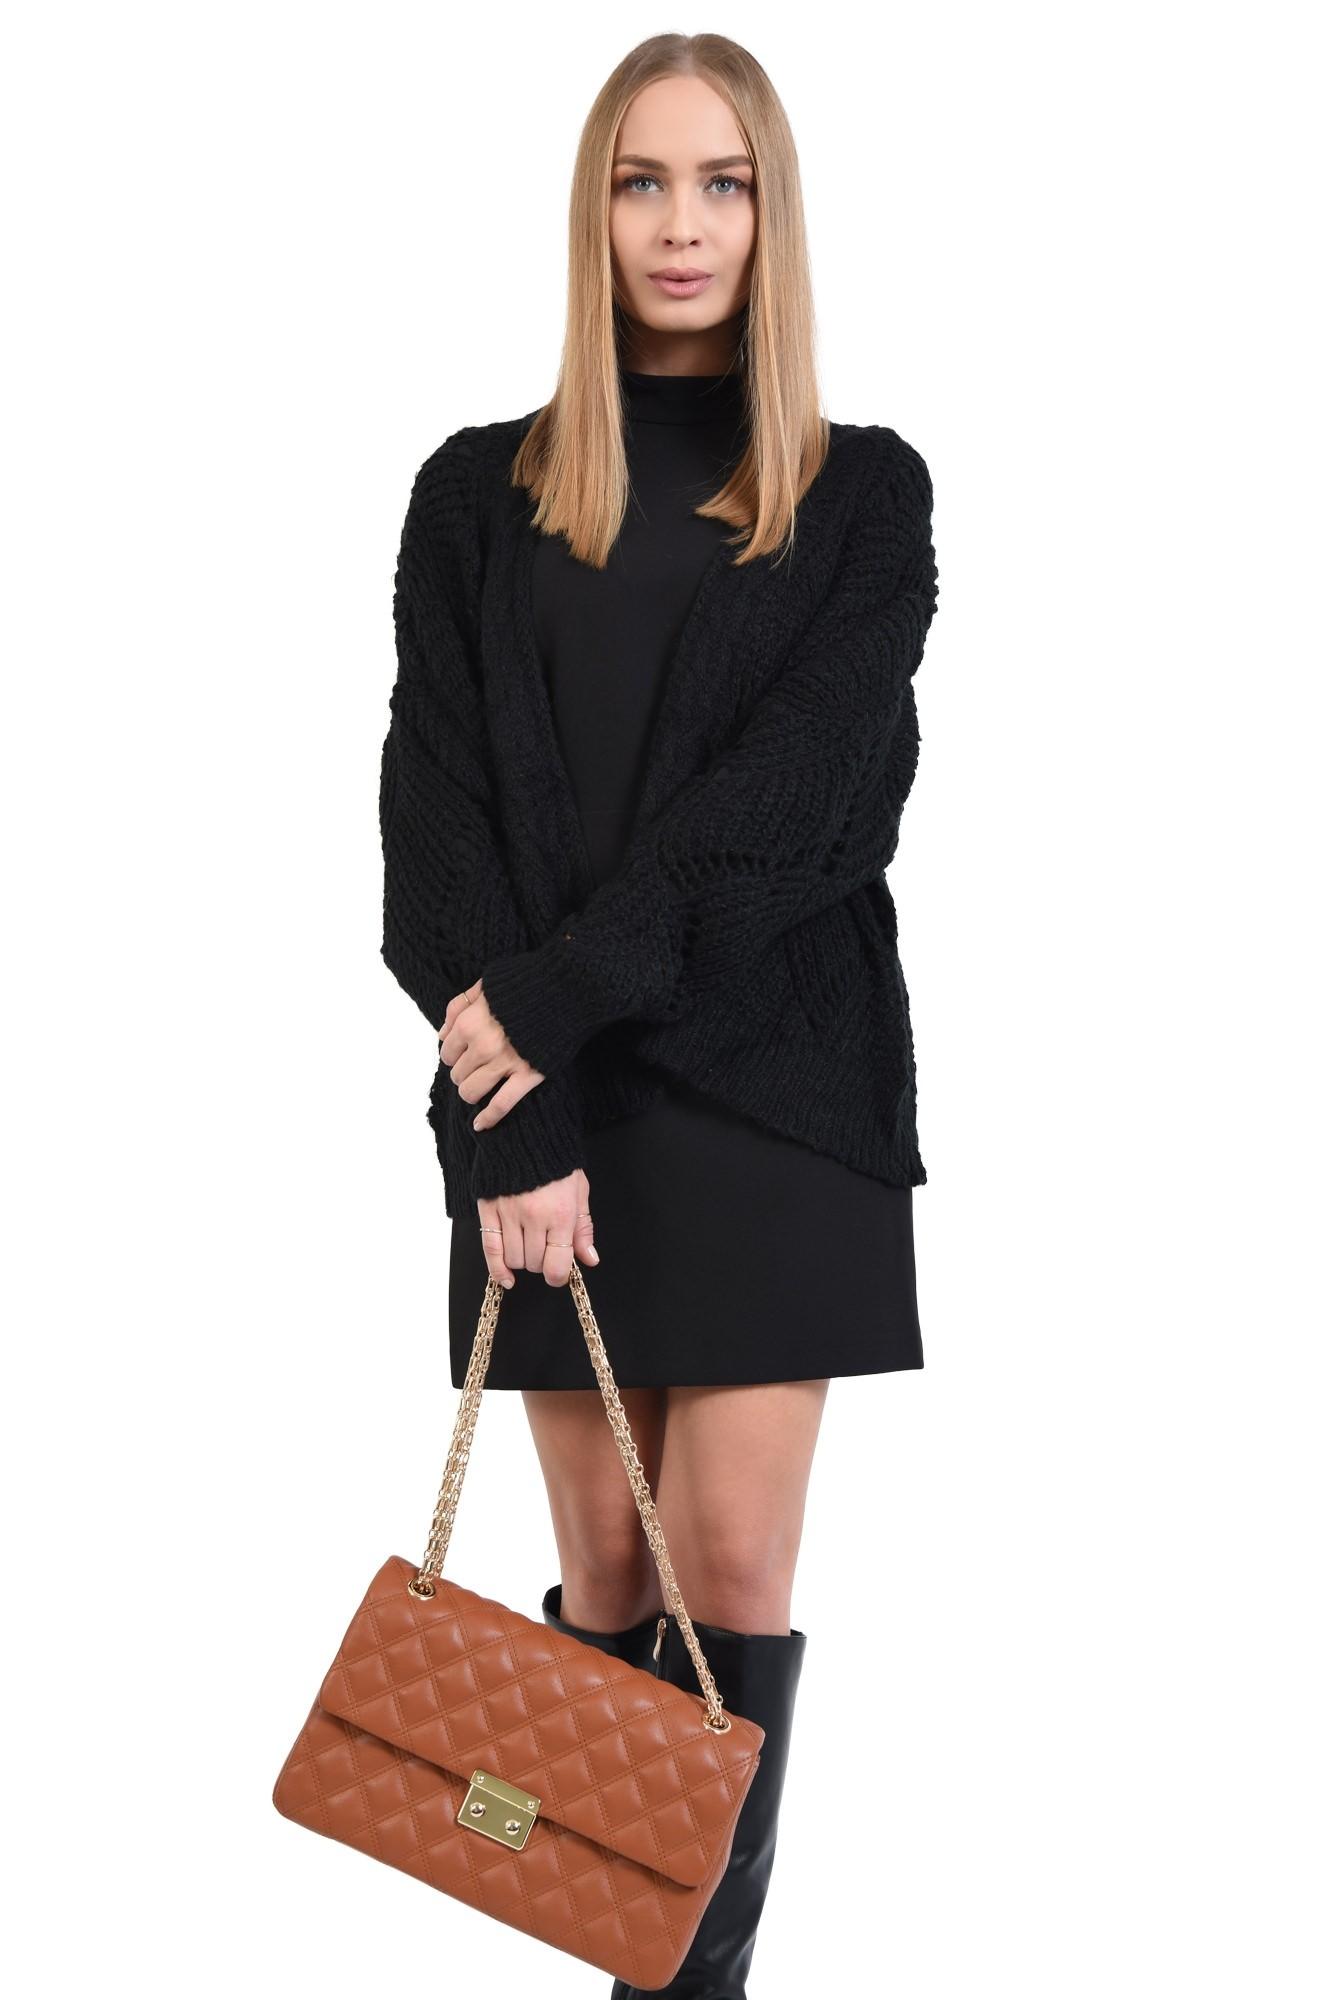 0 - pulover cu gaurele, motive ajurate, maneci bufante, negru